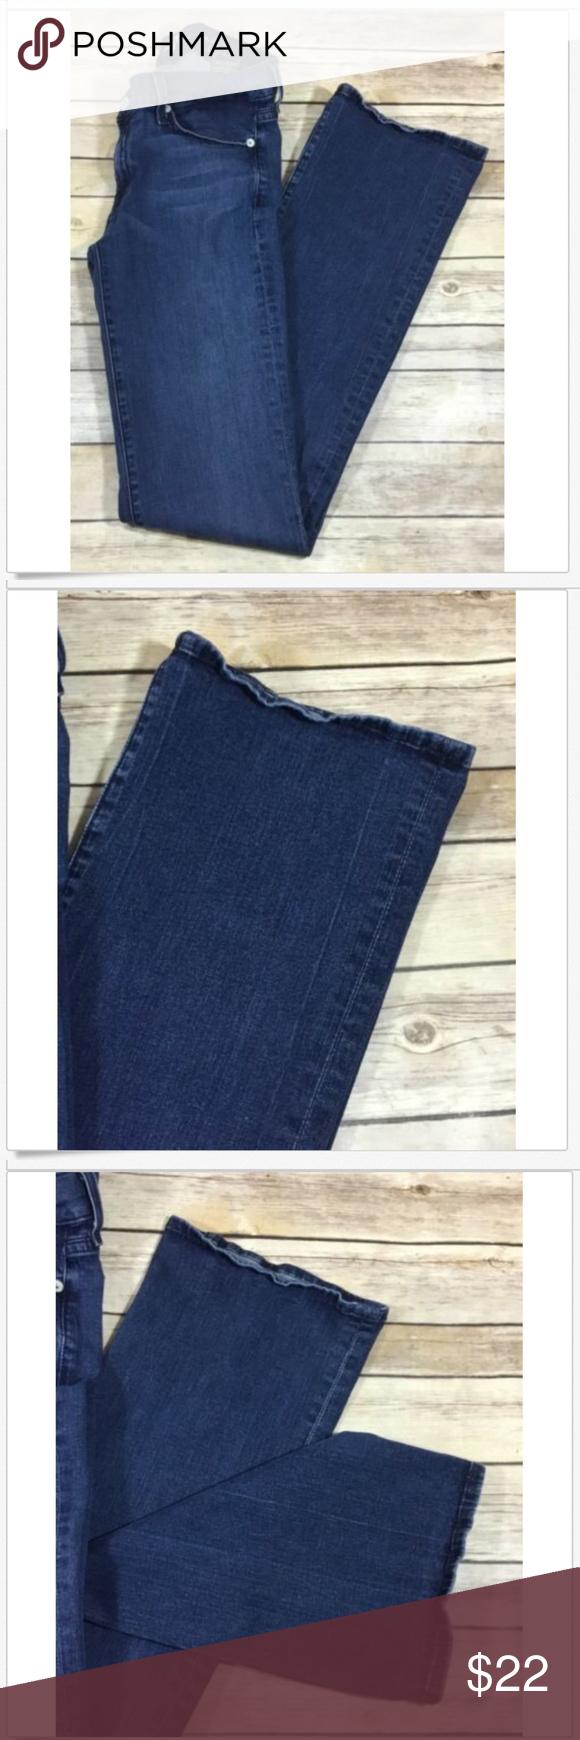 41d4cd4e635 For All Mankind Skinny Bootcut Denim Jeans 28 7 For All Mankind Women s  Skinny Boot